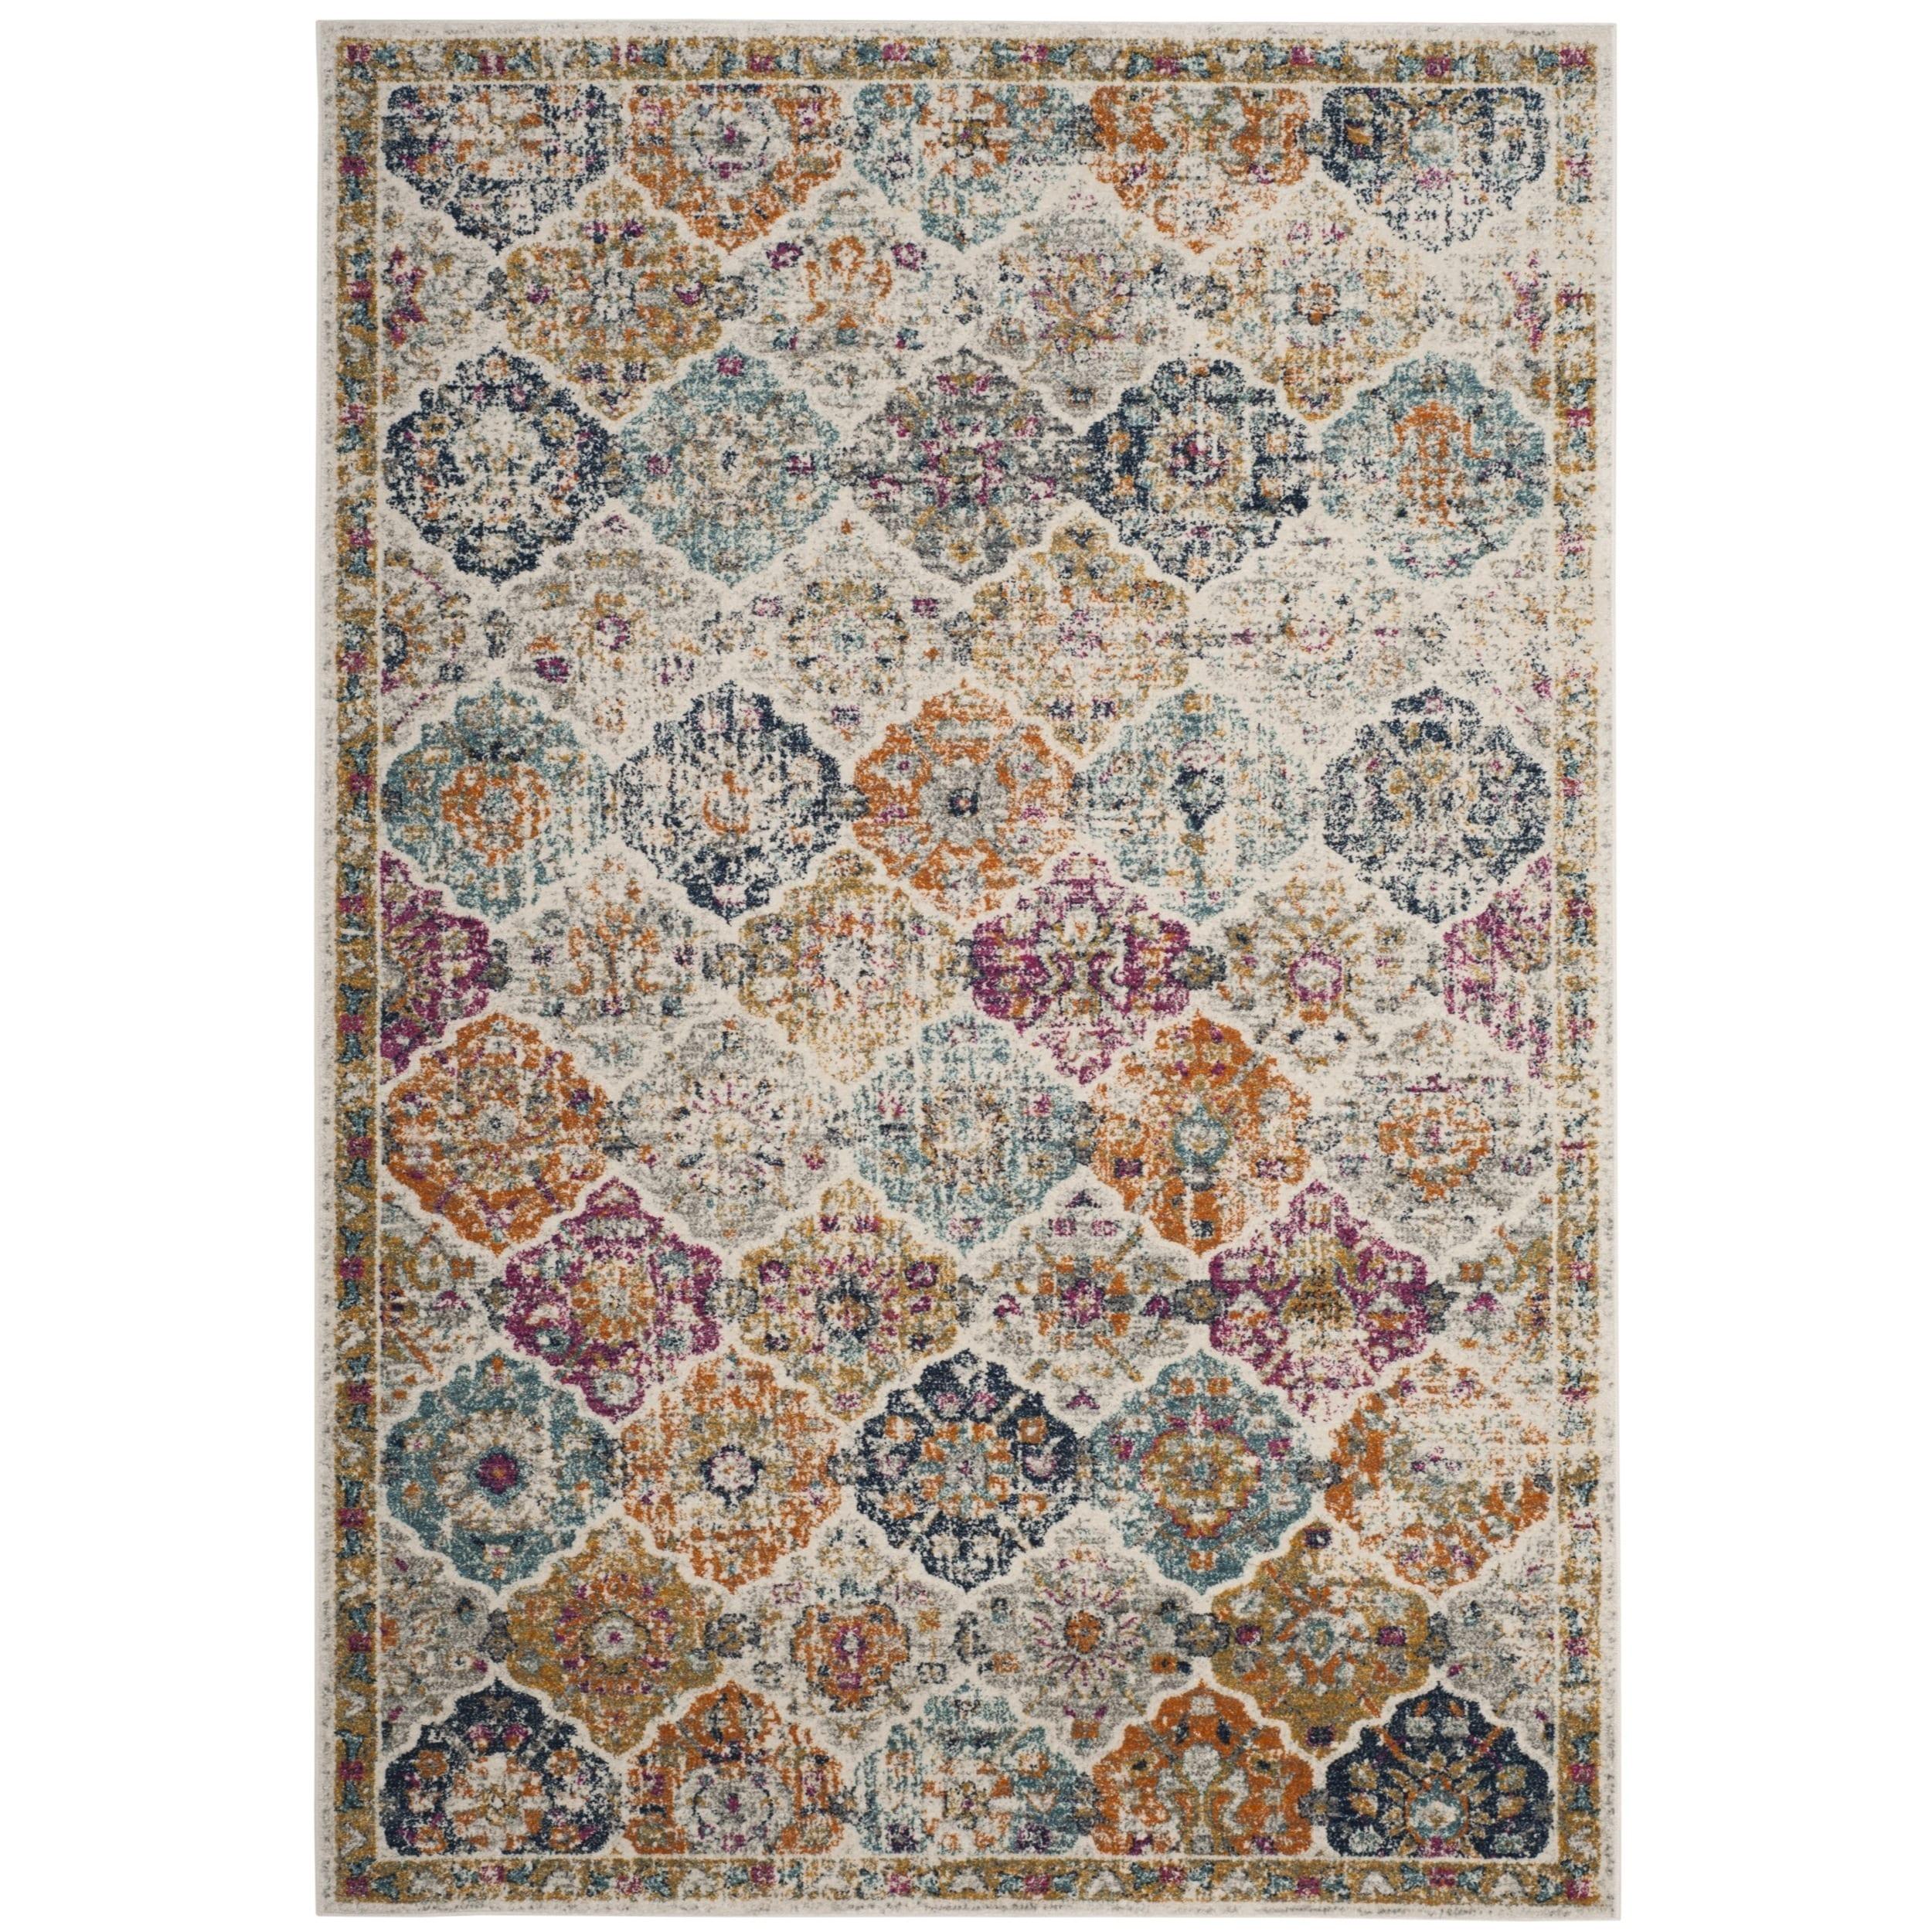 elegant of rug x wool handmade firstumcnewiberia area bohemian new vintage ft turkish